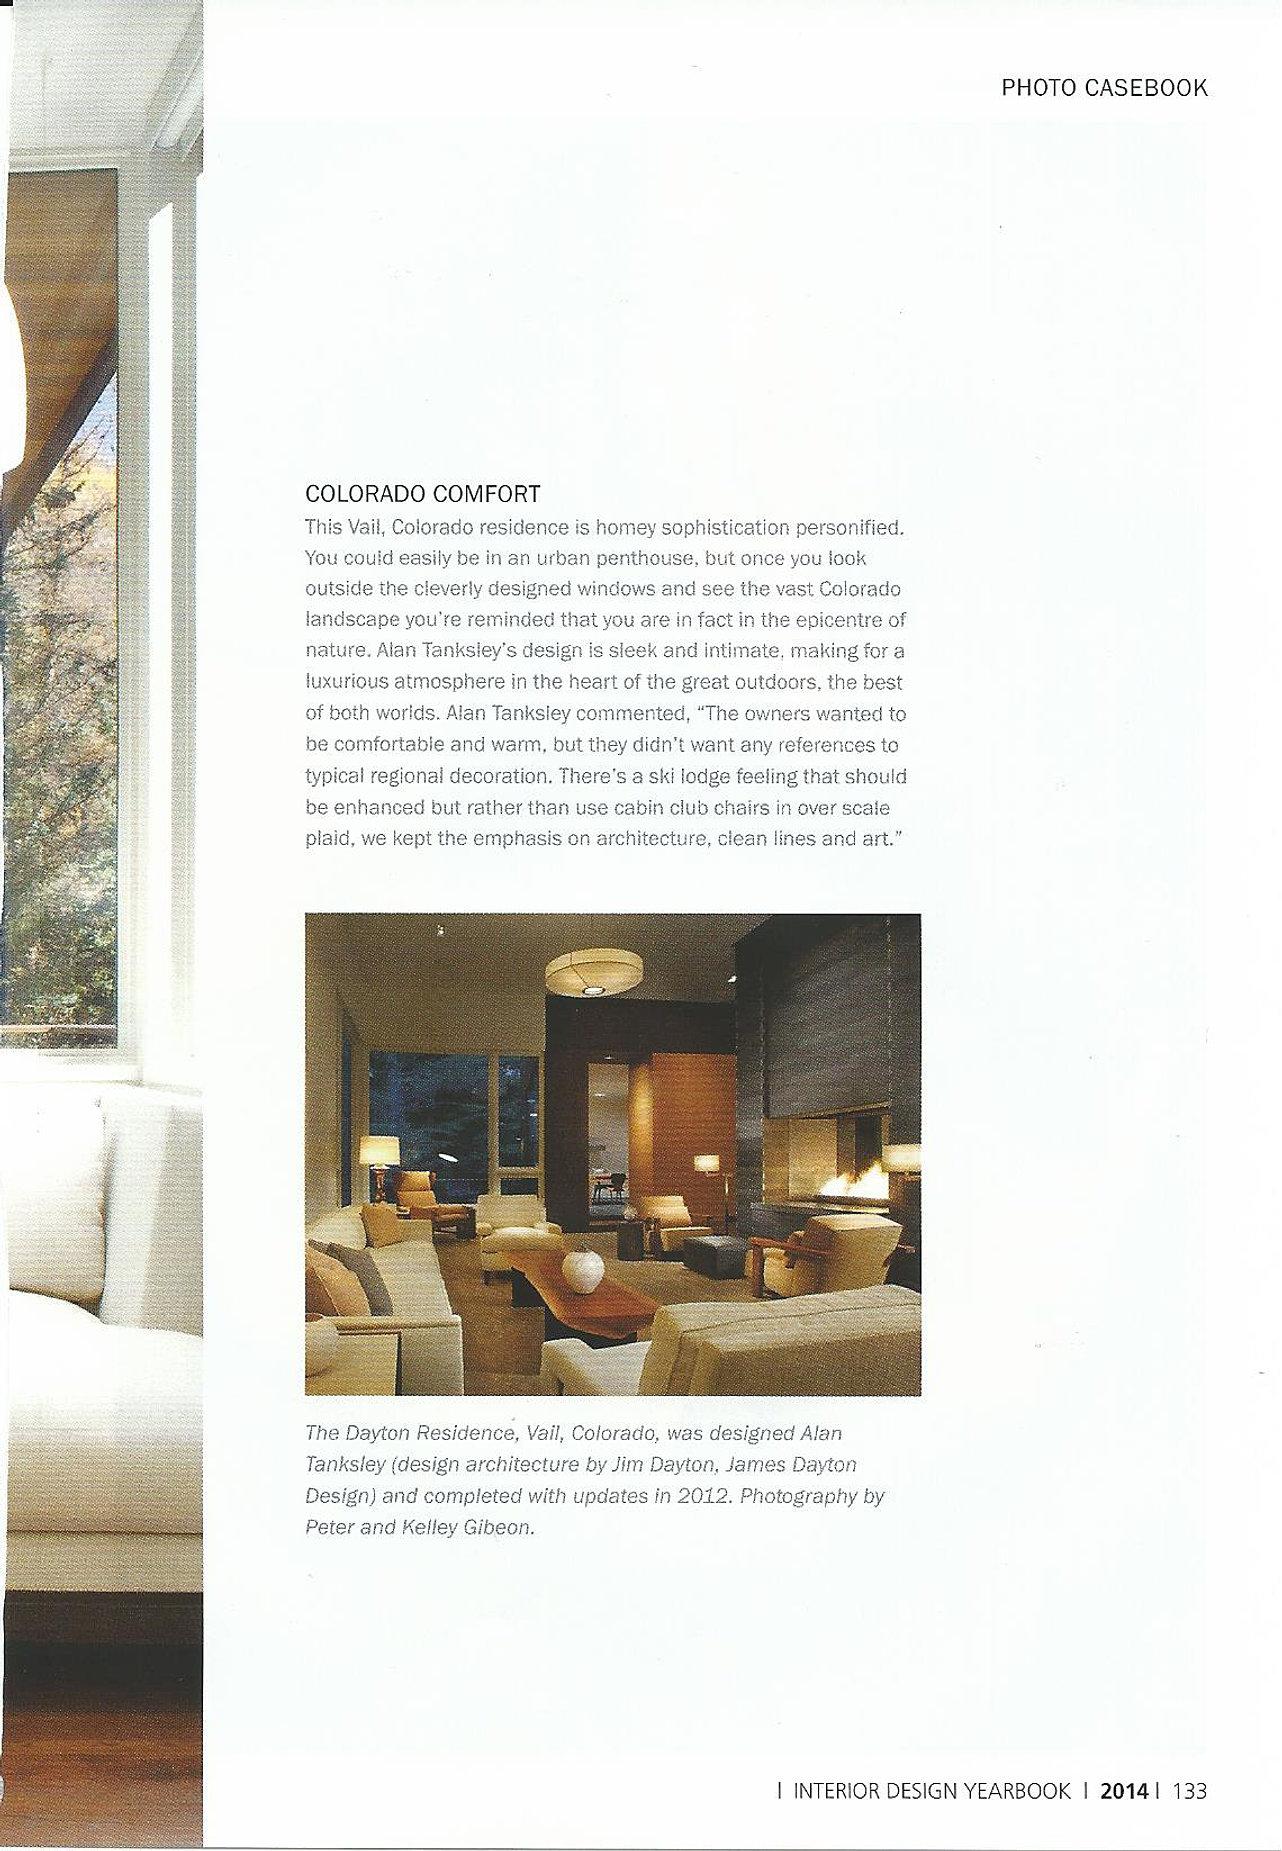 Alan Tanksley Interior Design Yearbook 2014